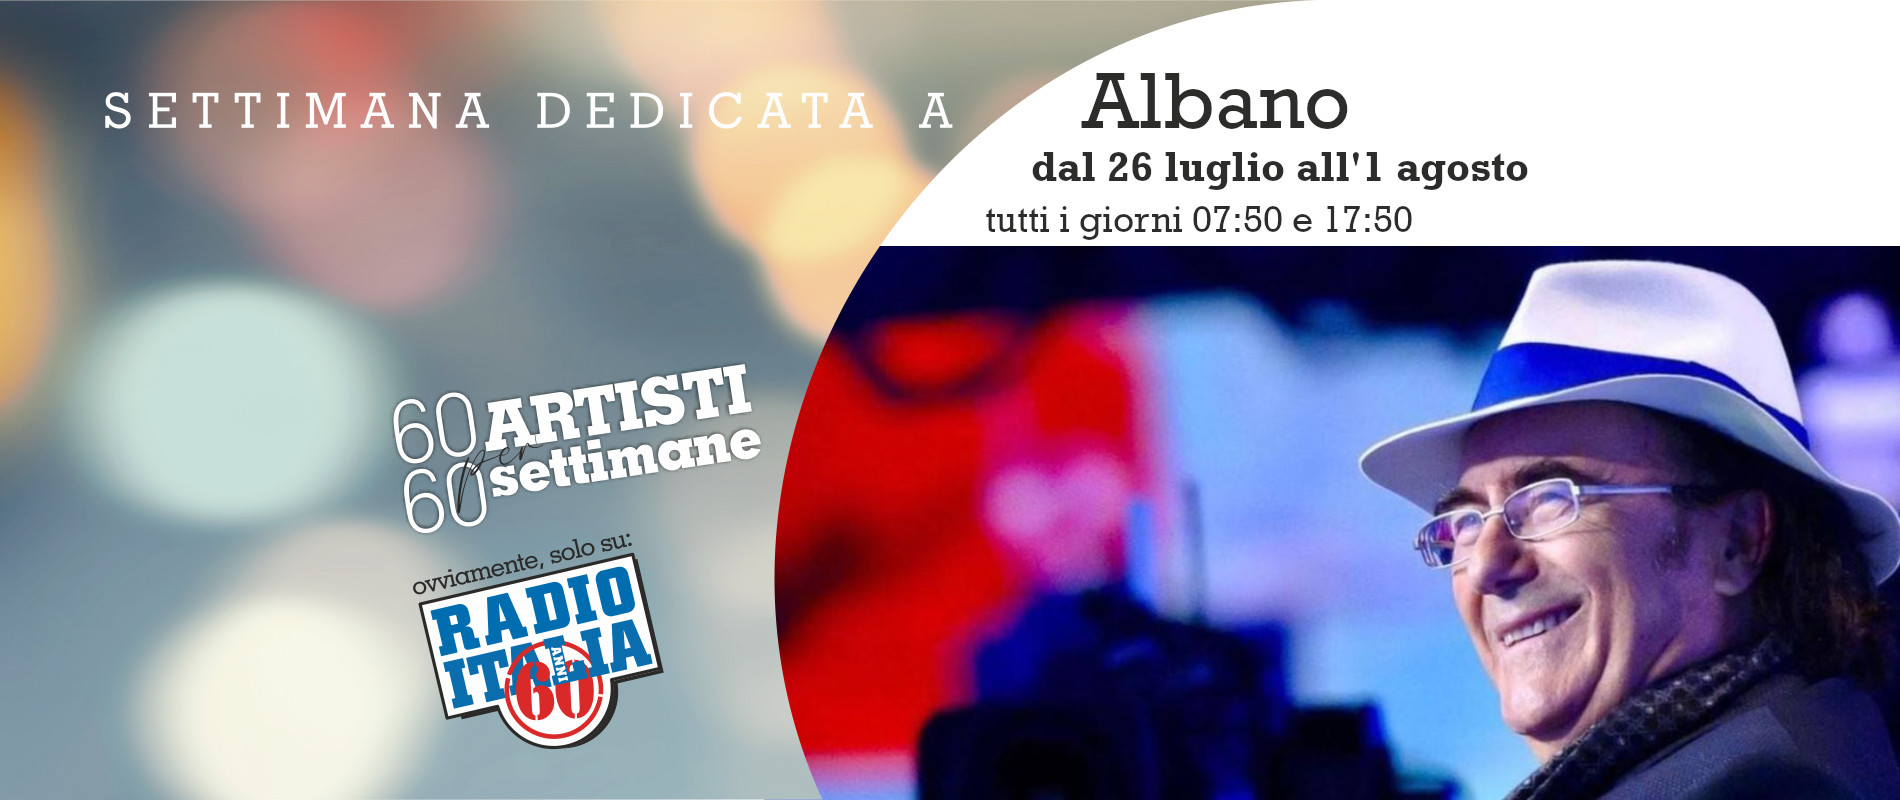 albano_RADIOITA60_60artisti60settimane_1900x800_ARTISTA